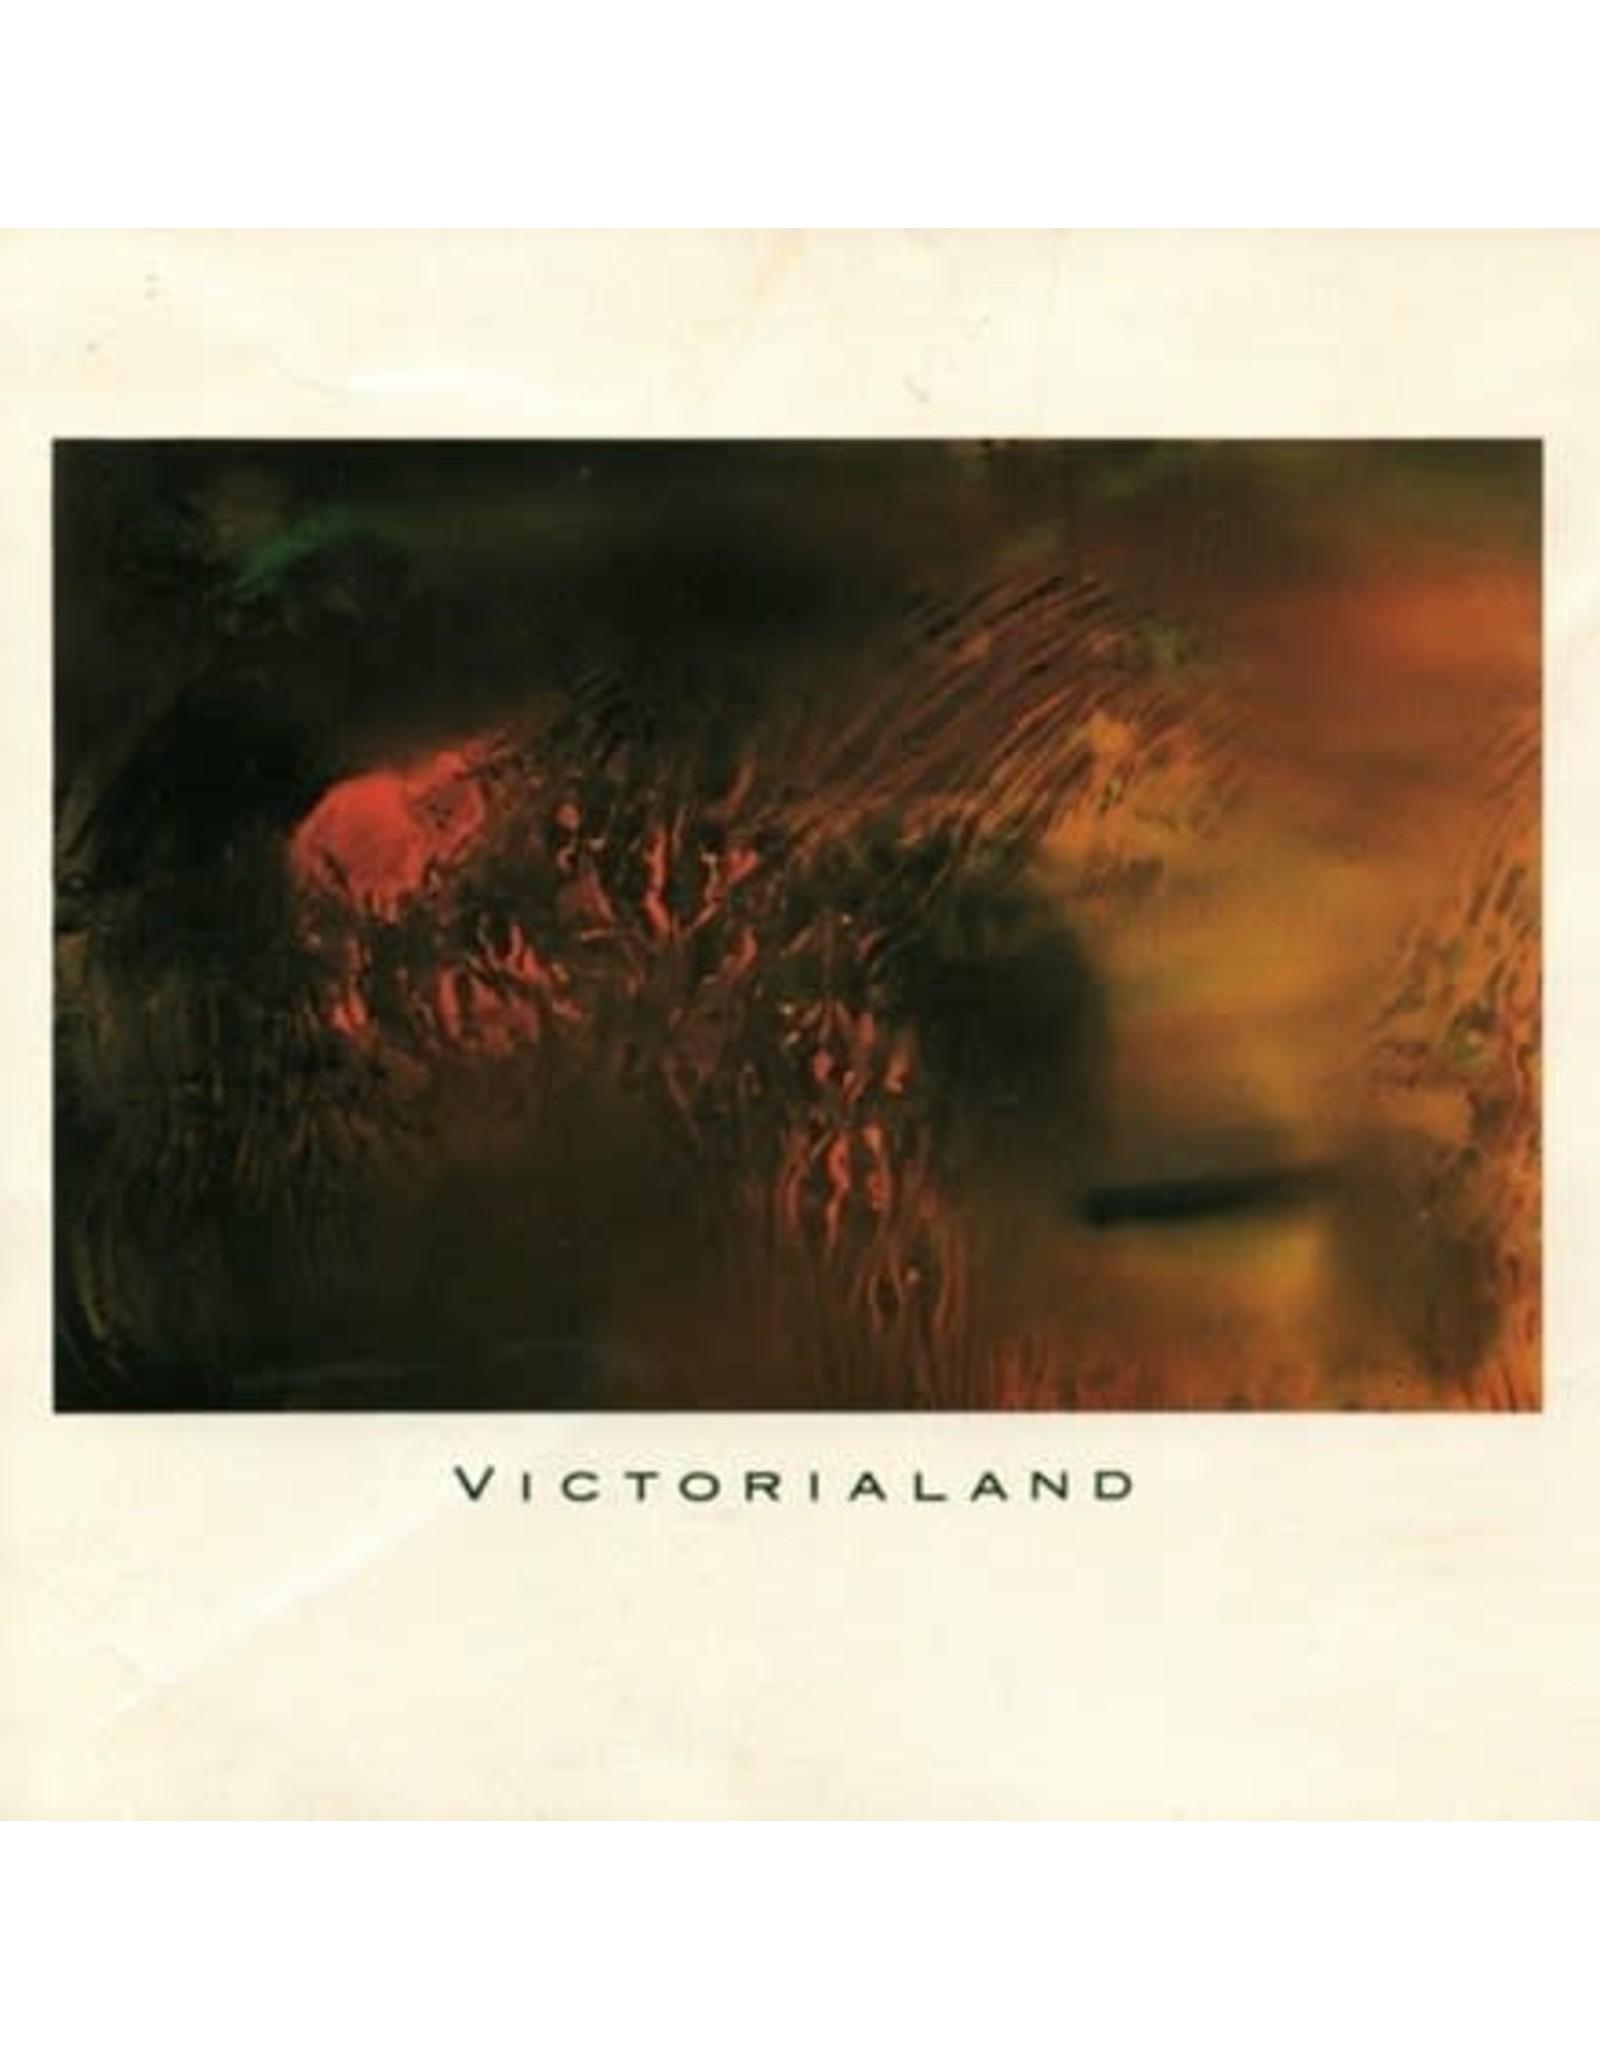 4AD Cocteau Twins: Victorialand LP